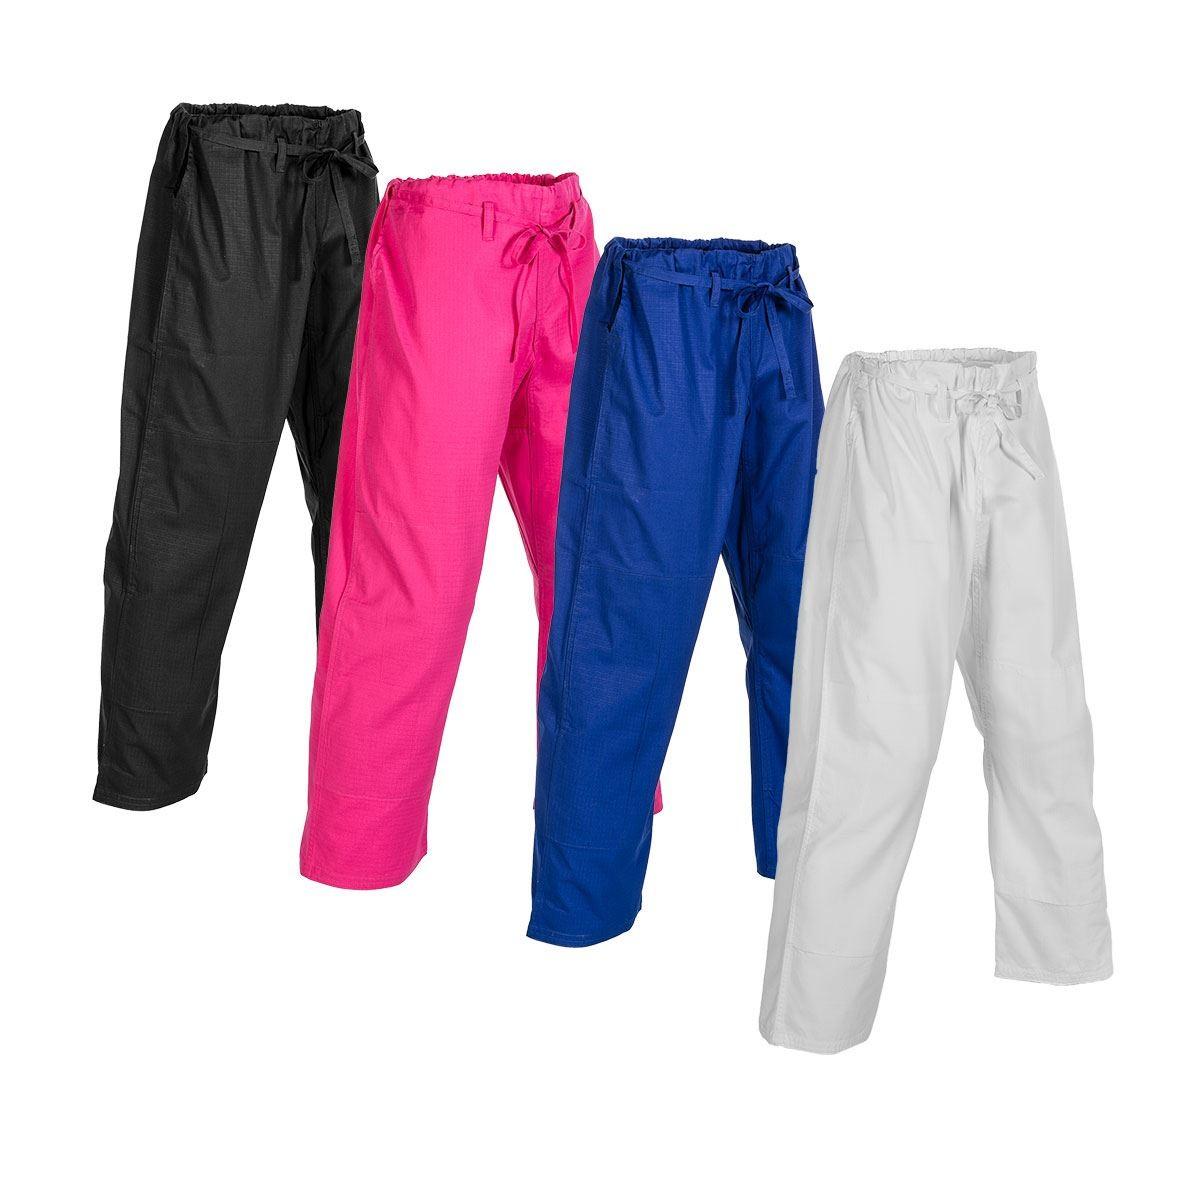 Century Martial Arts 6 oz. Ripstop BJJ Traditional Pants